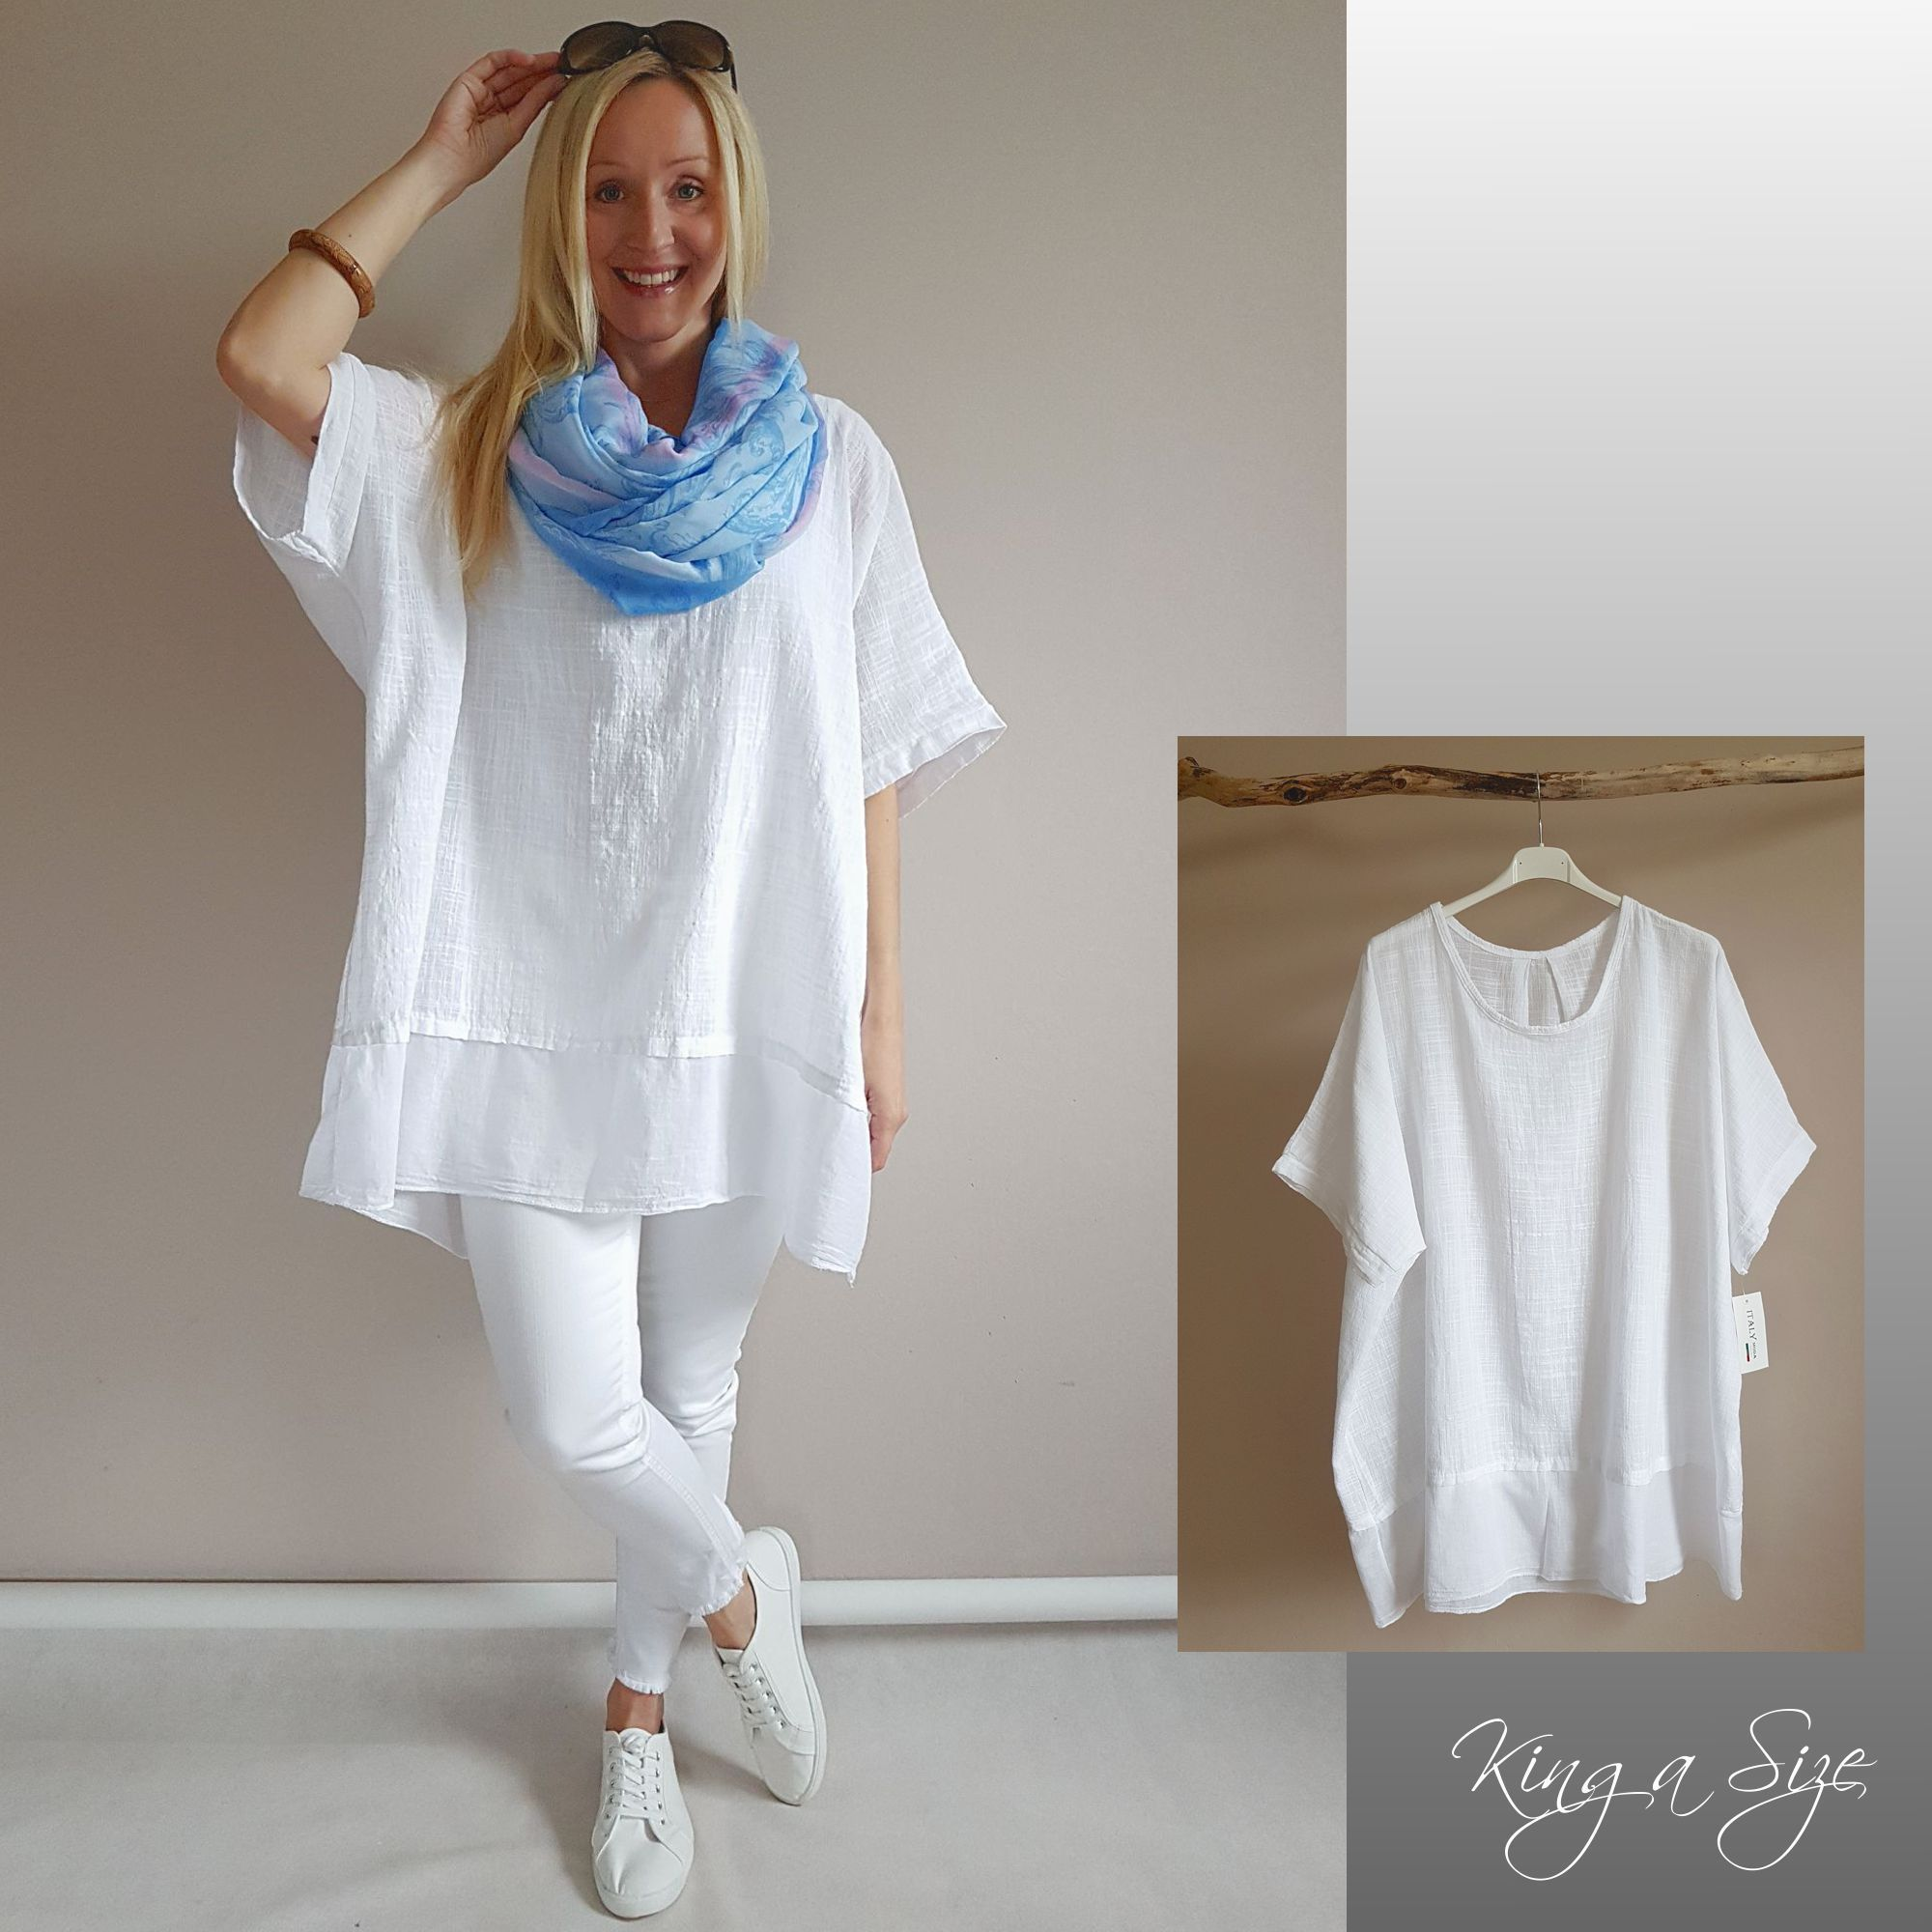 Damen Lagenloock Pullover Tunika Shirt Longshirt A-Form Print 46 48 50  Italy